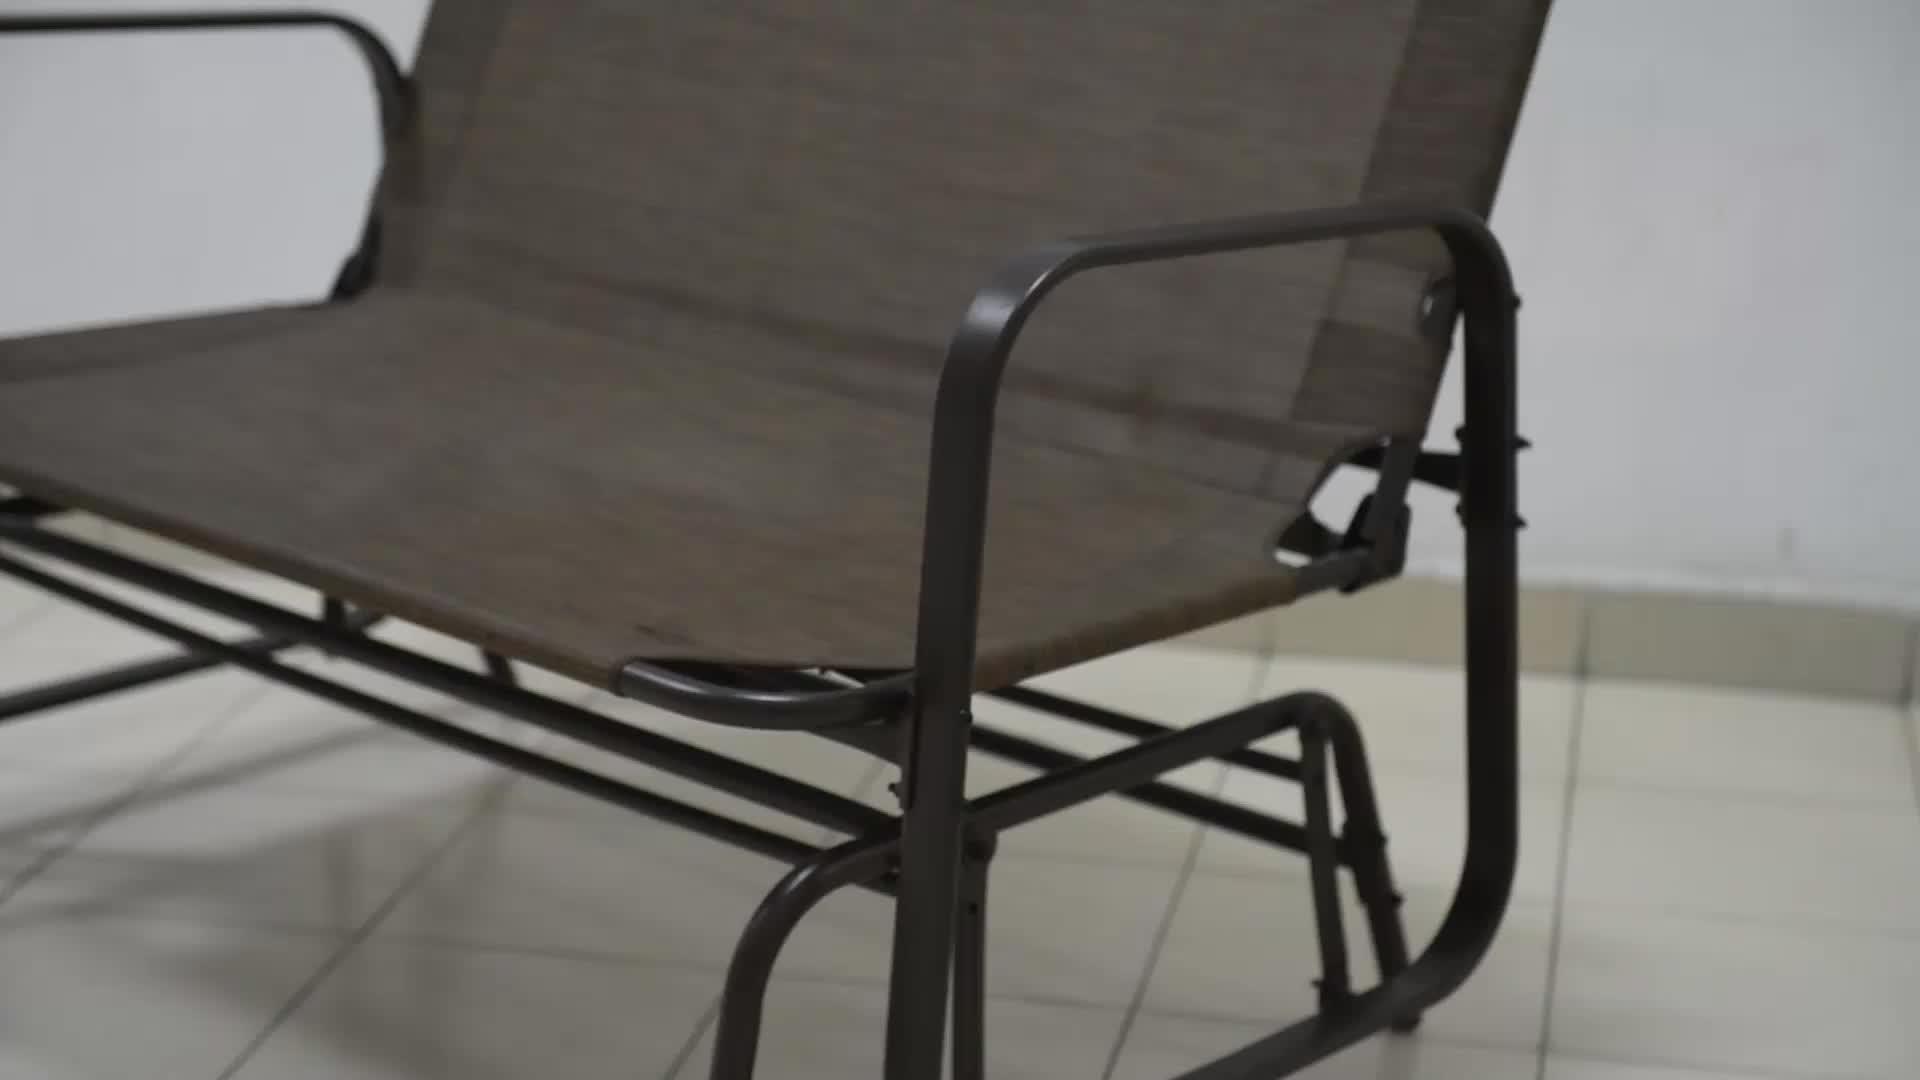 Outdoor Garden Steel Frame Patio Swing Glider Loveseat Bench Rocking Chair  – Buy Outdoor Garden Bench,metal Garden Bench,glider Rocking Chair Product With Regard To Most Recently Released Steel Patio Swing Glider Benches (View 14 of 25)